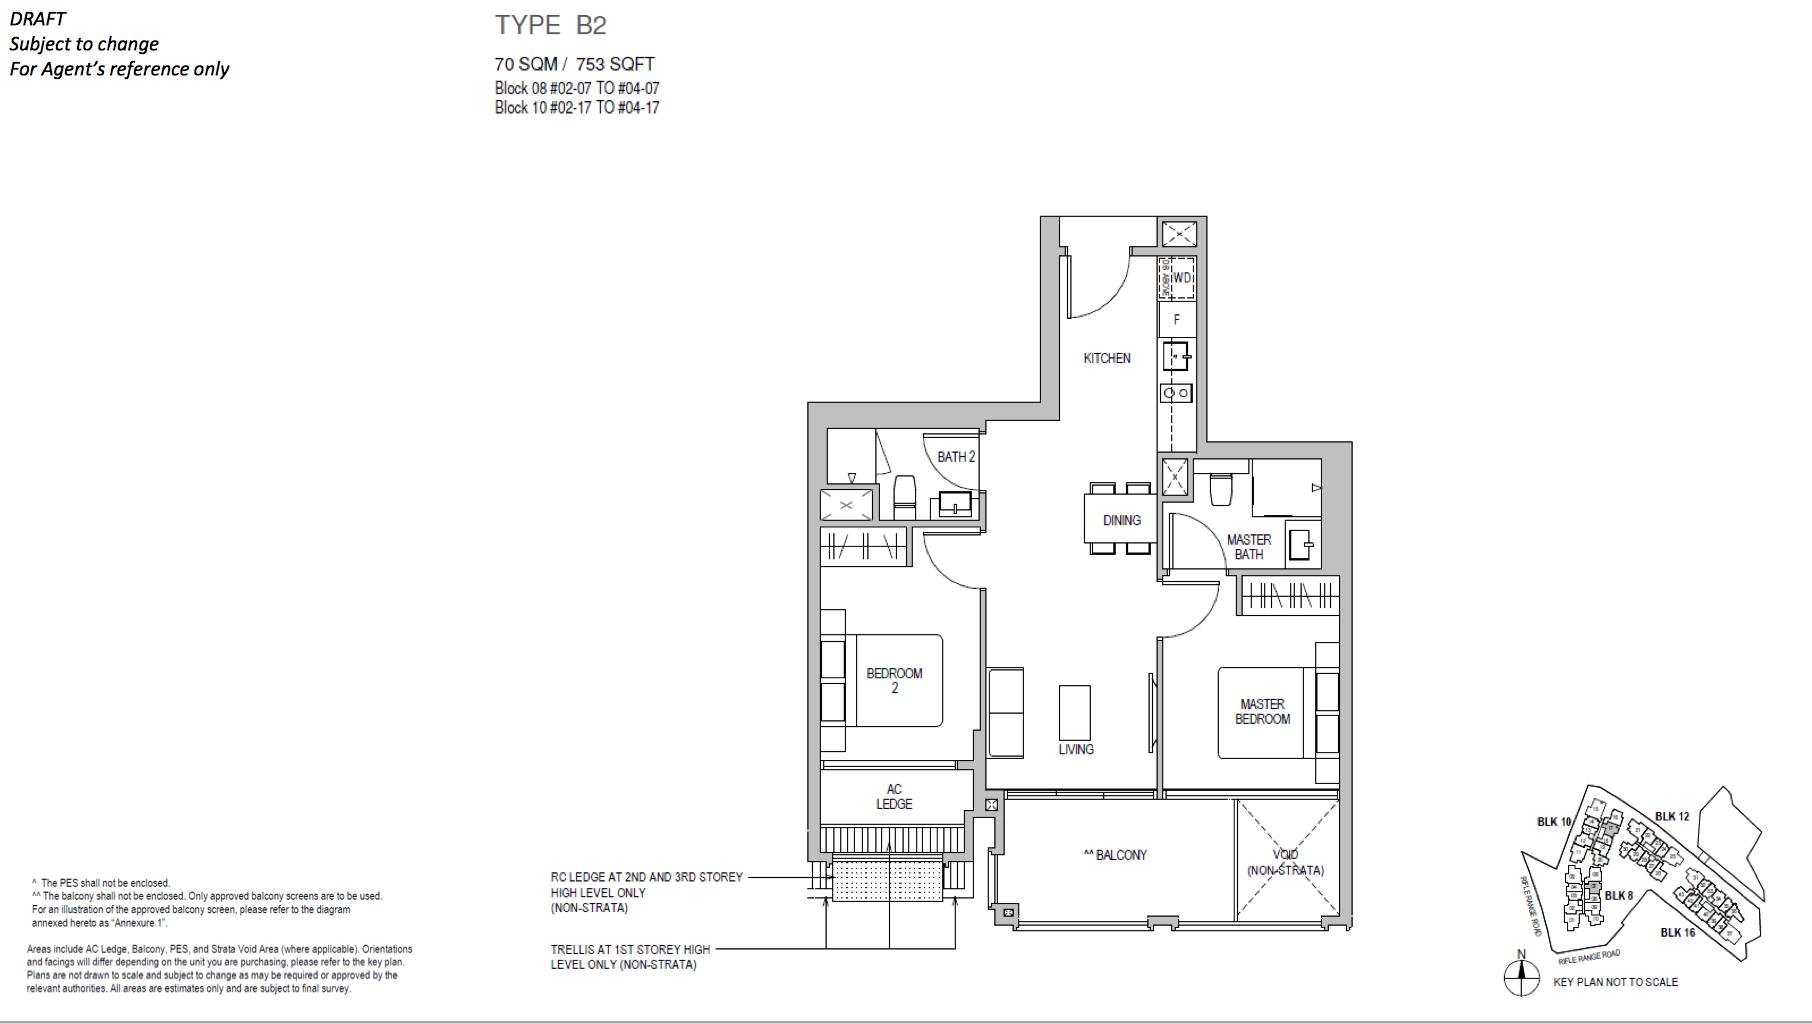 Mayfair Gardens floor plan type B2